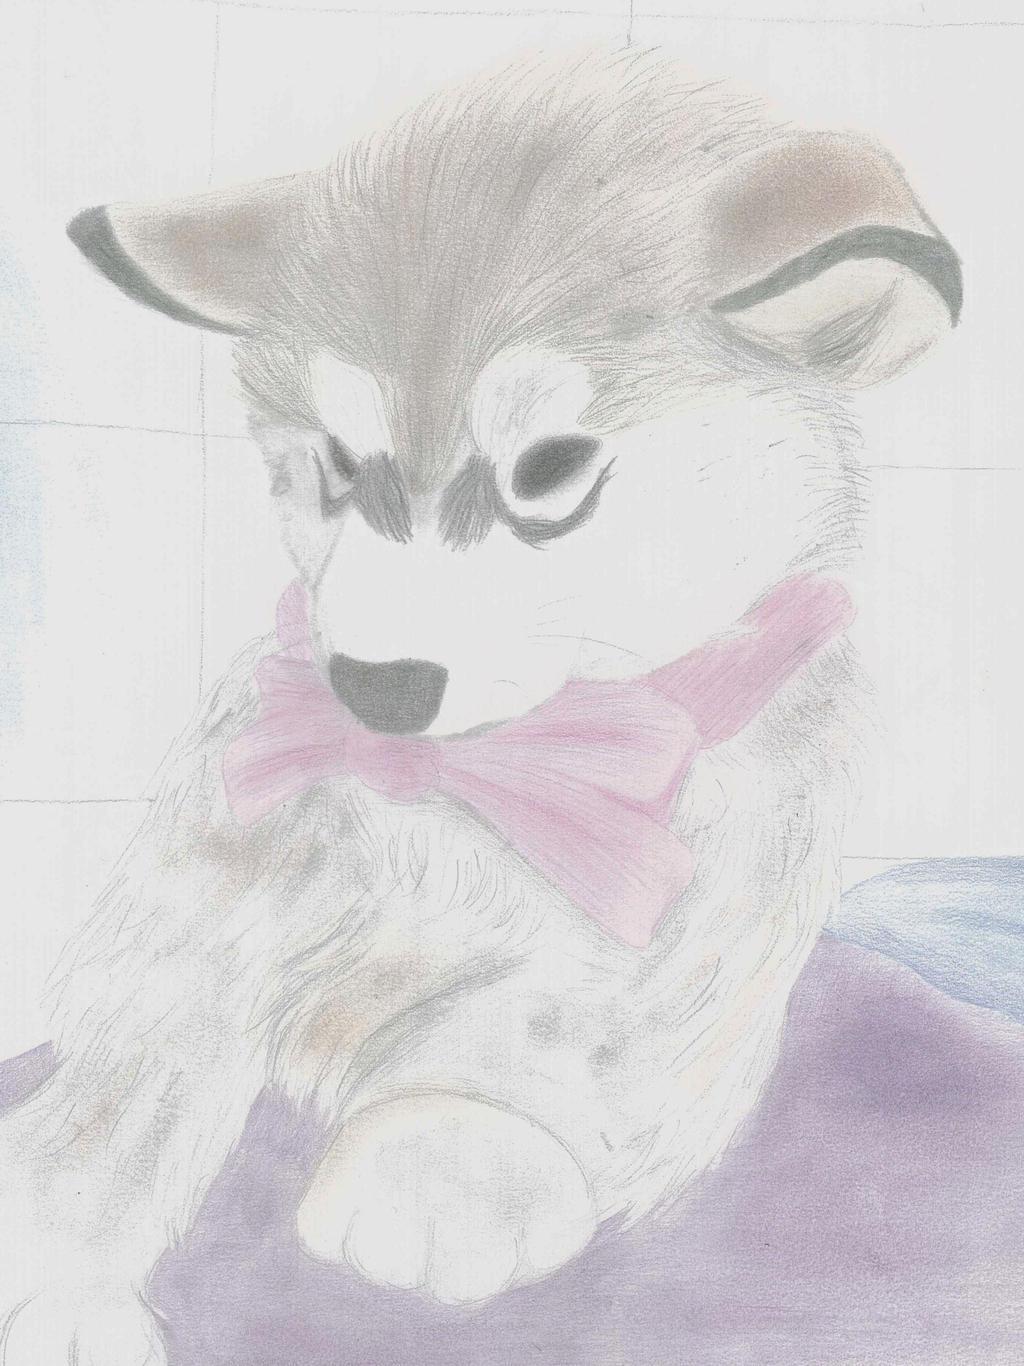 cutie cute husky puppy by aussie0 traditional art drawings animals    Cute Husky Puppy Drawings